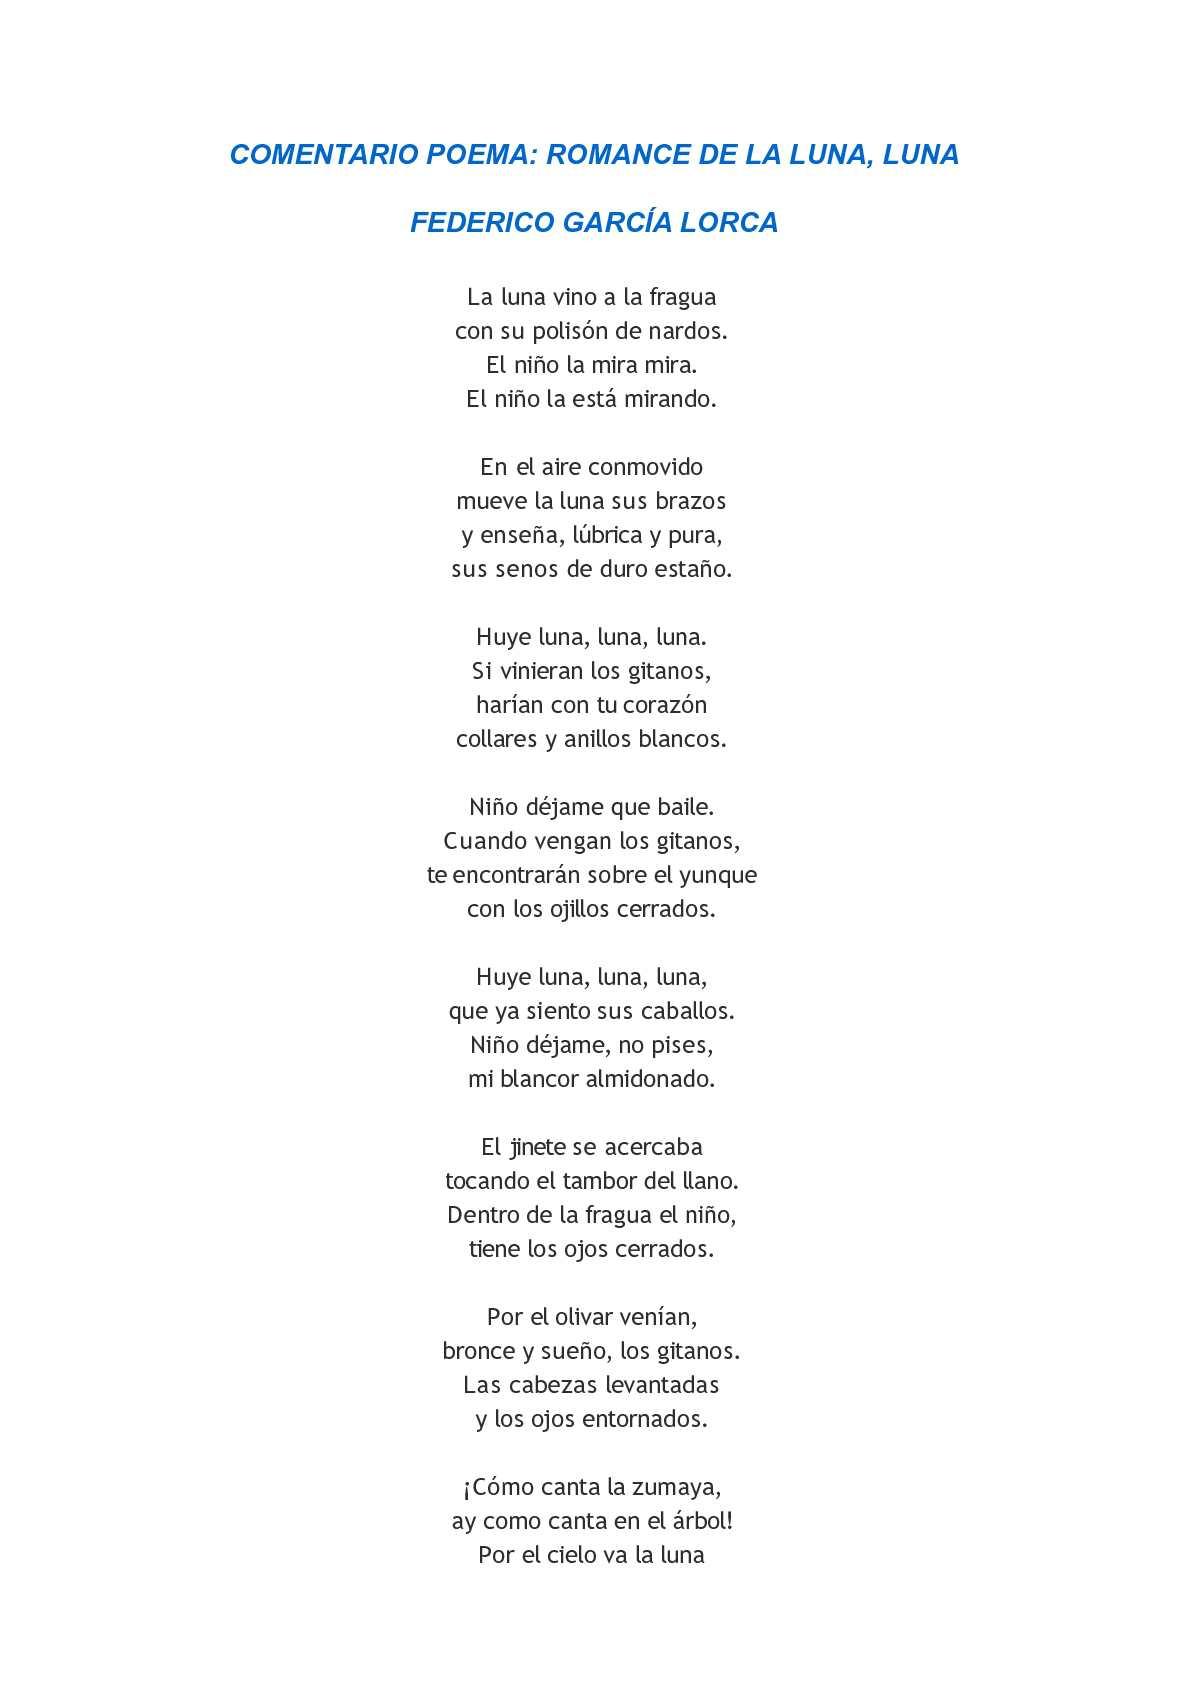 Calaméo Comentario Poema Alba Guimerà